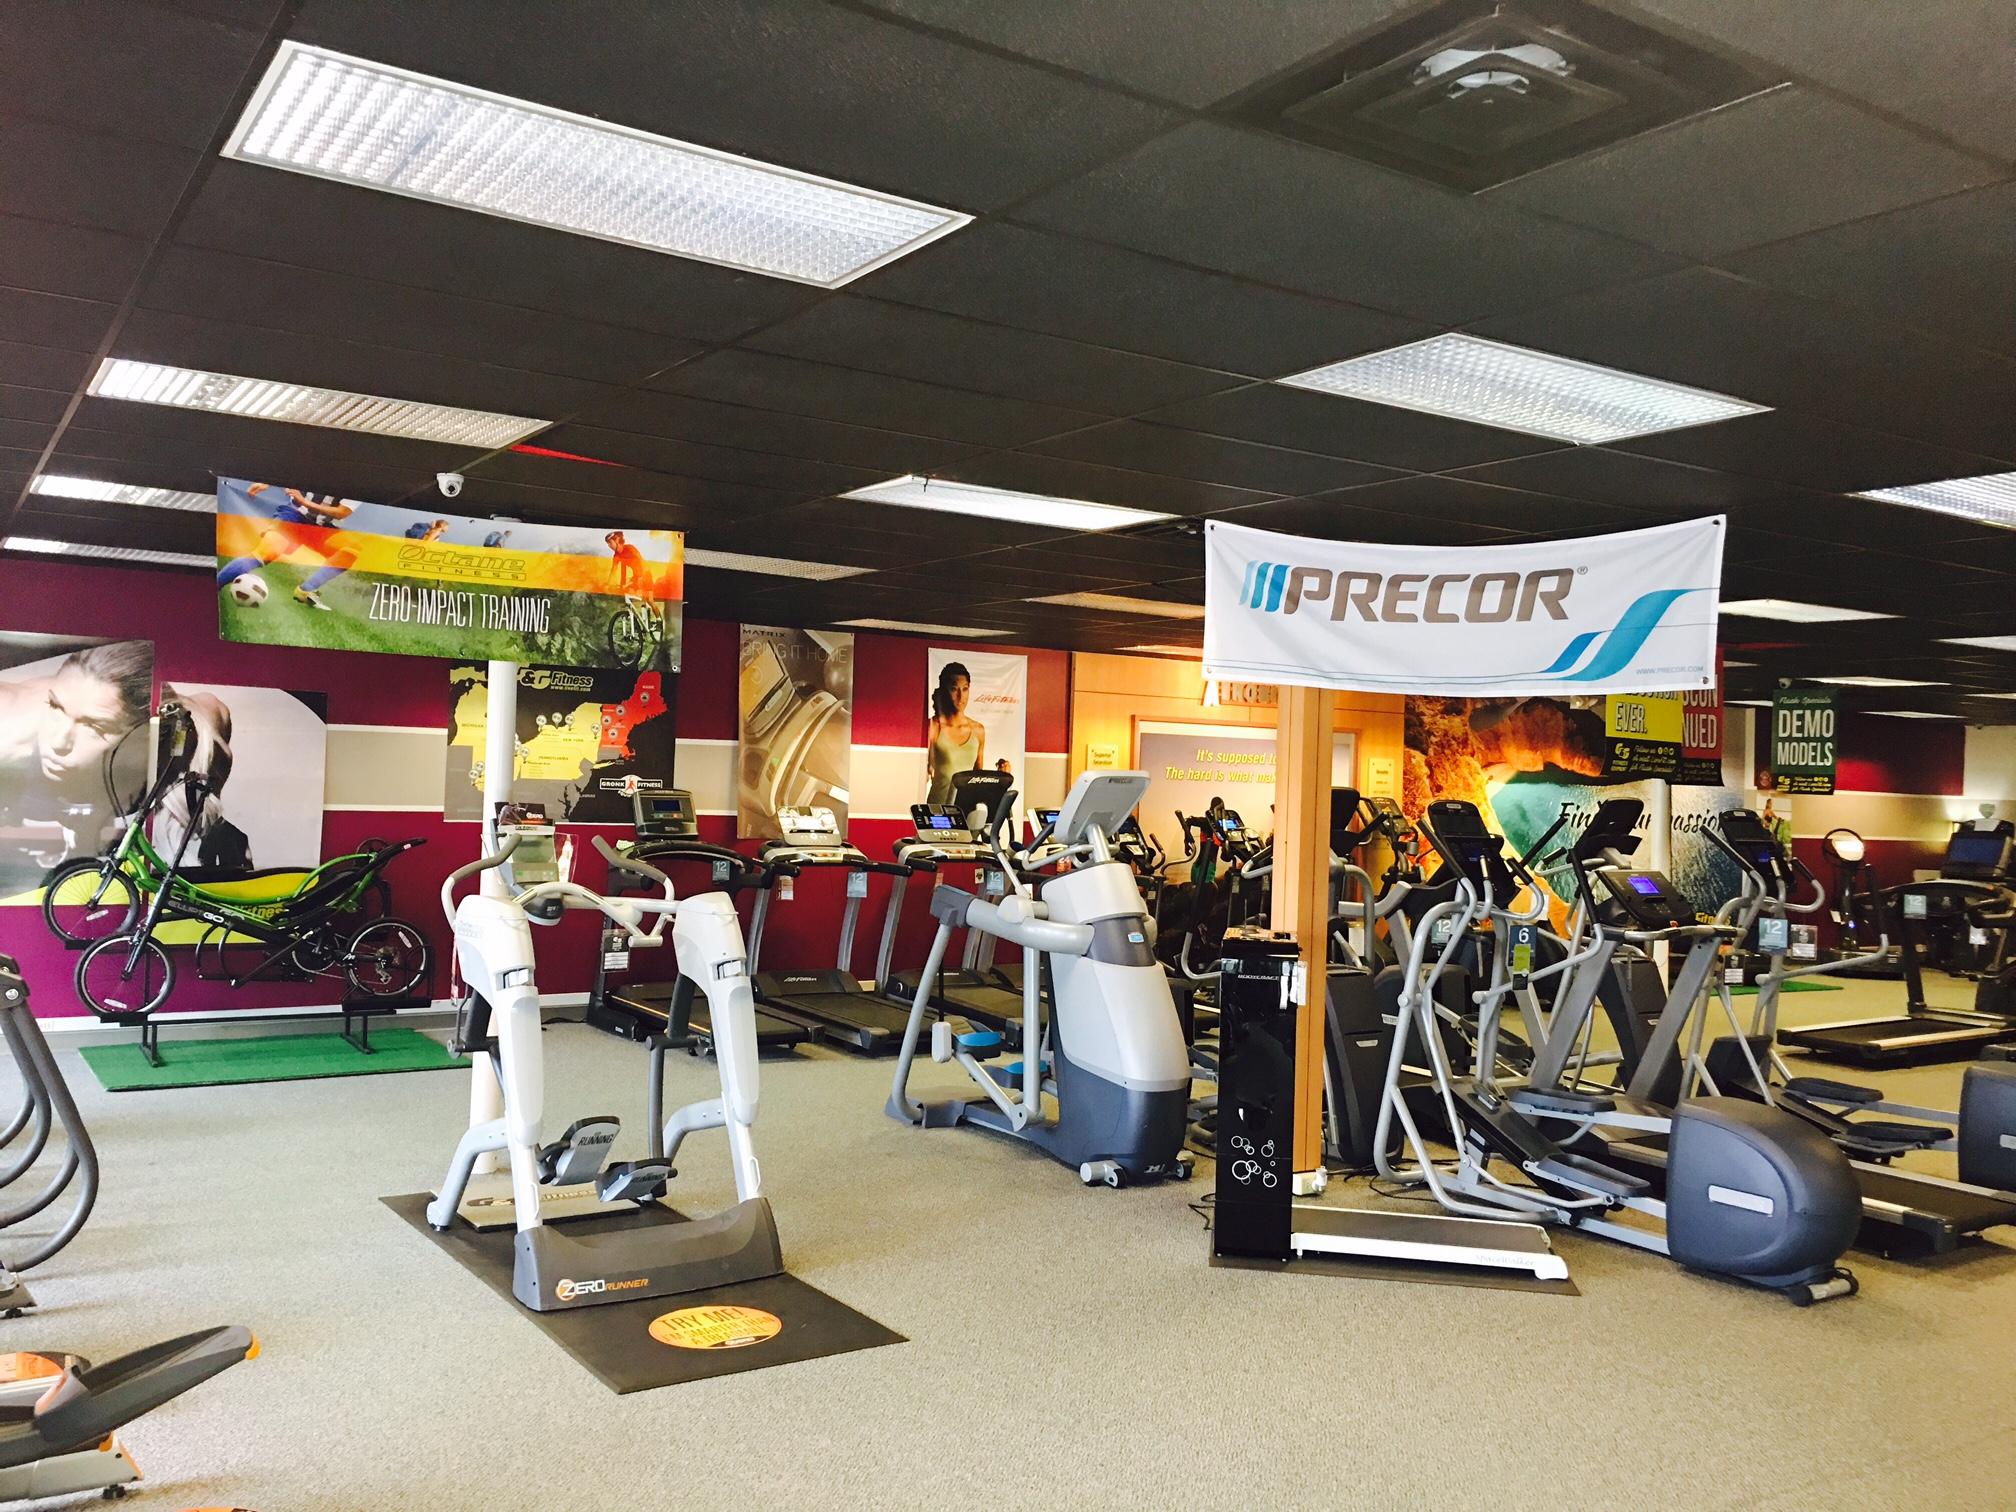 G&G Fitness Equipment - Dayton image 4